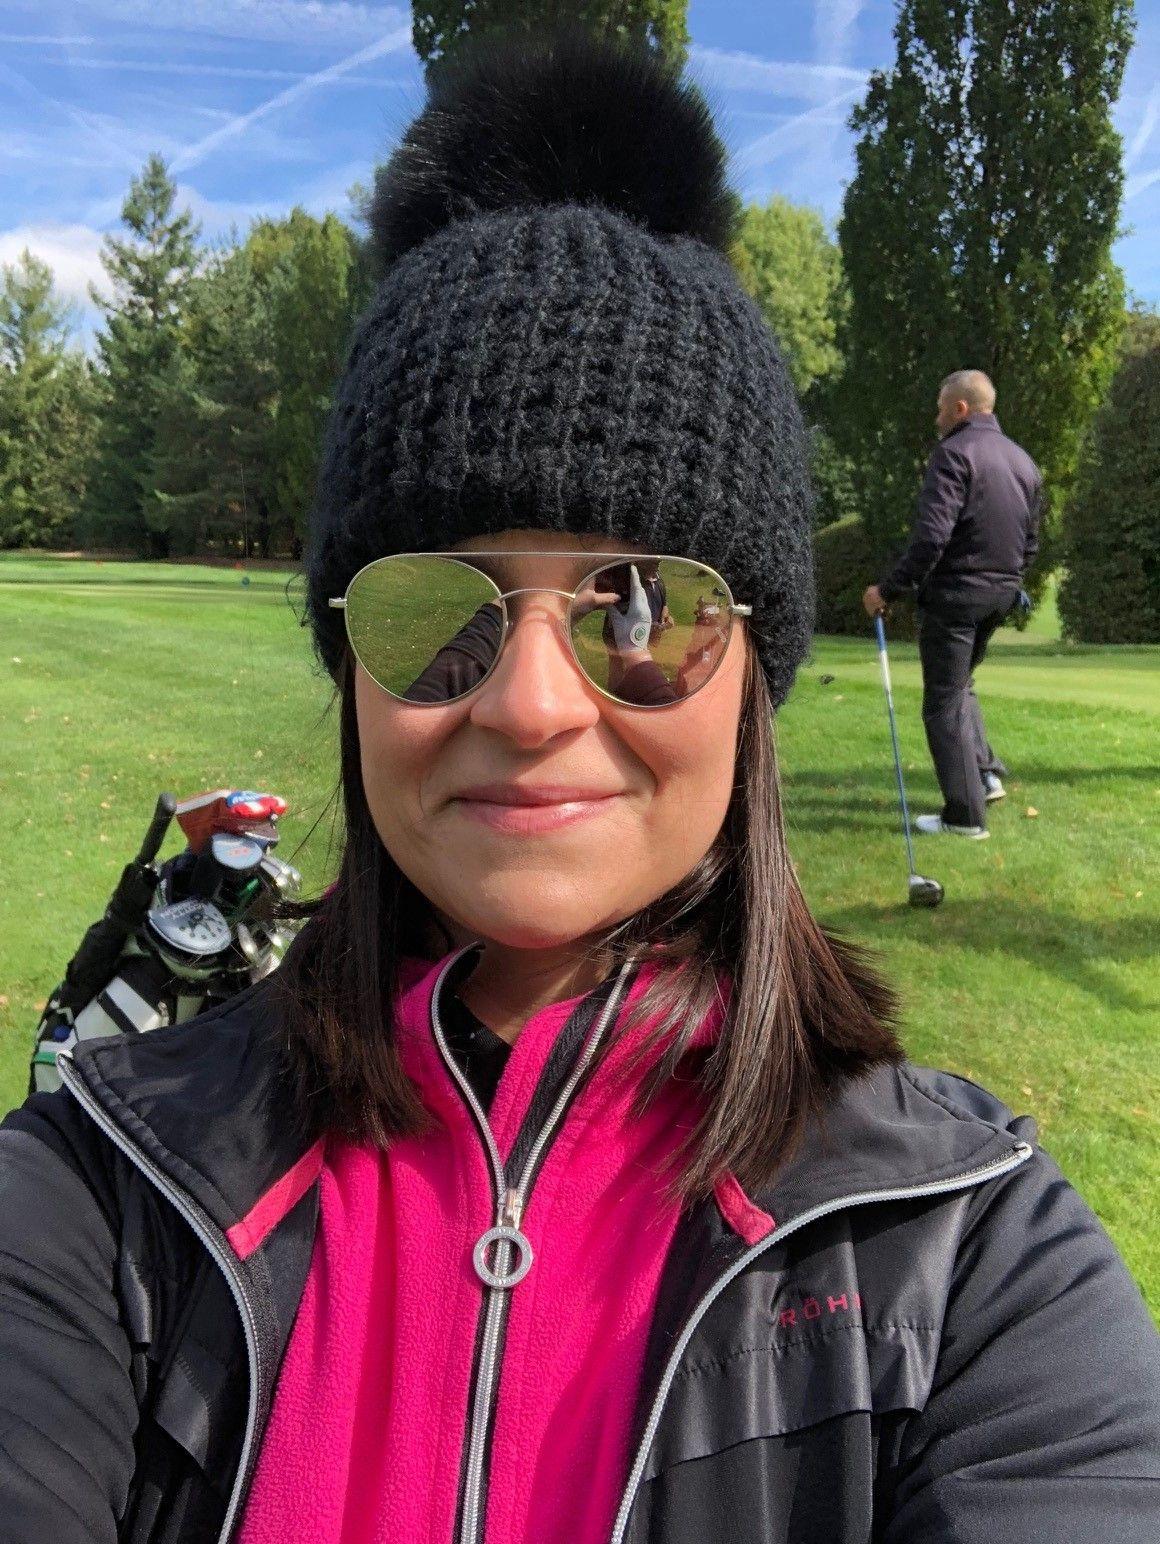 Avatar of golfer named Julie Correard